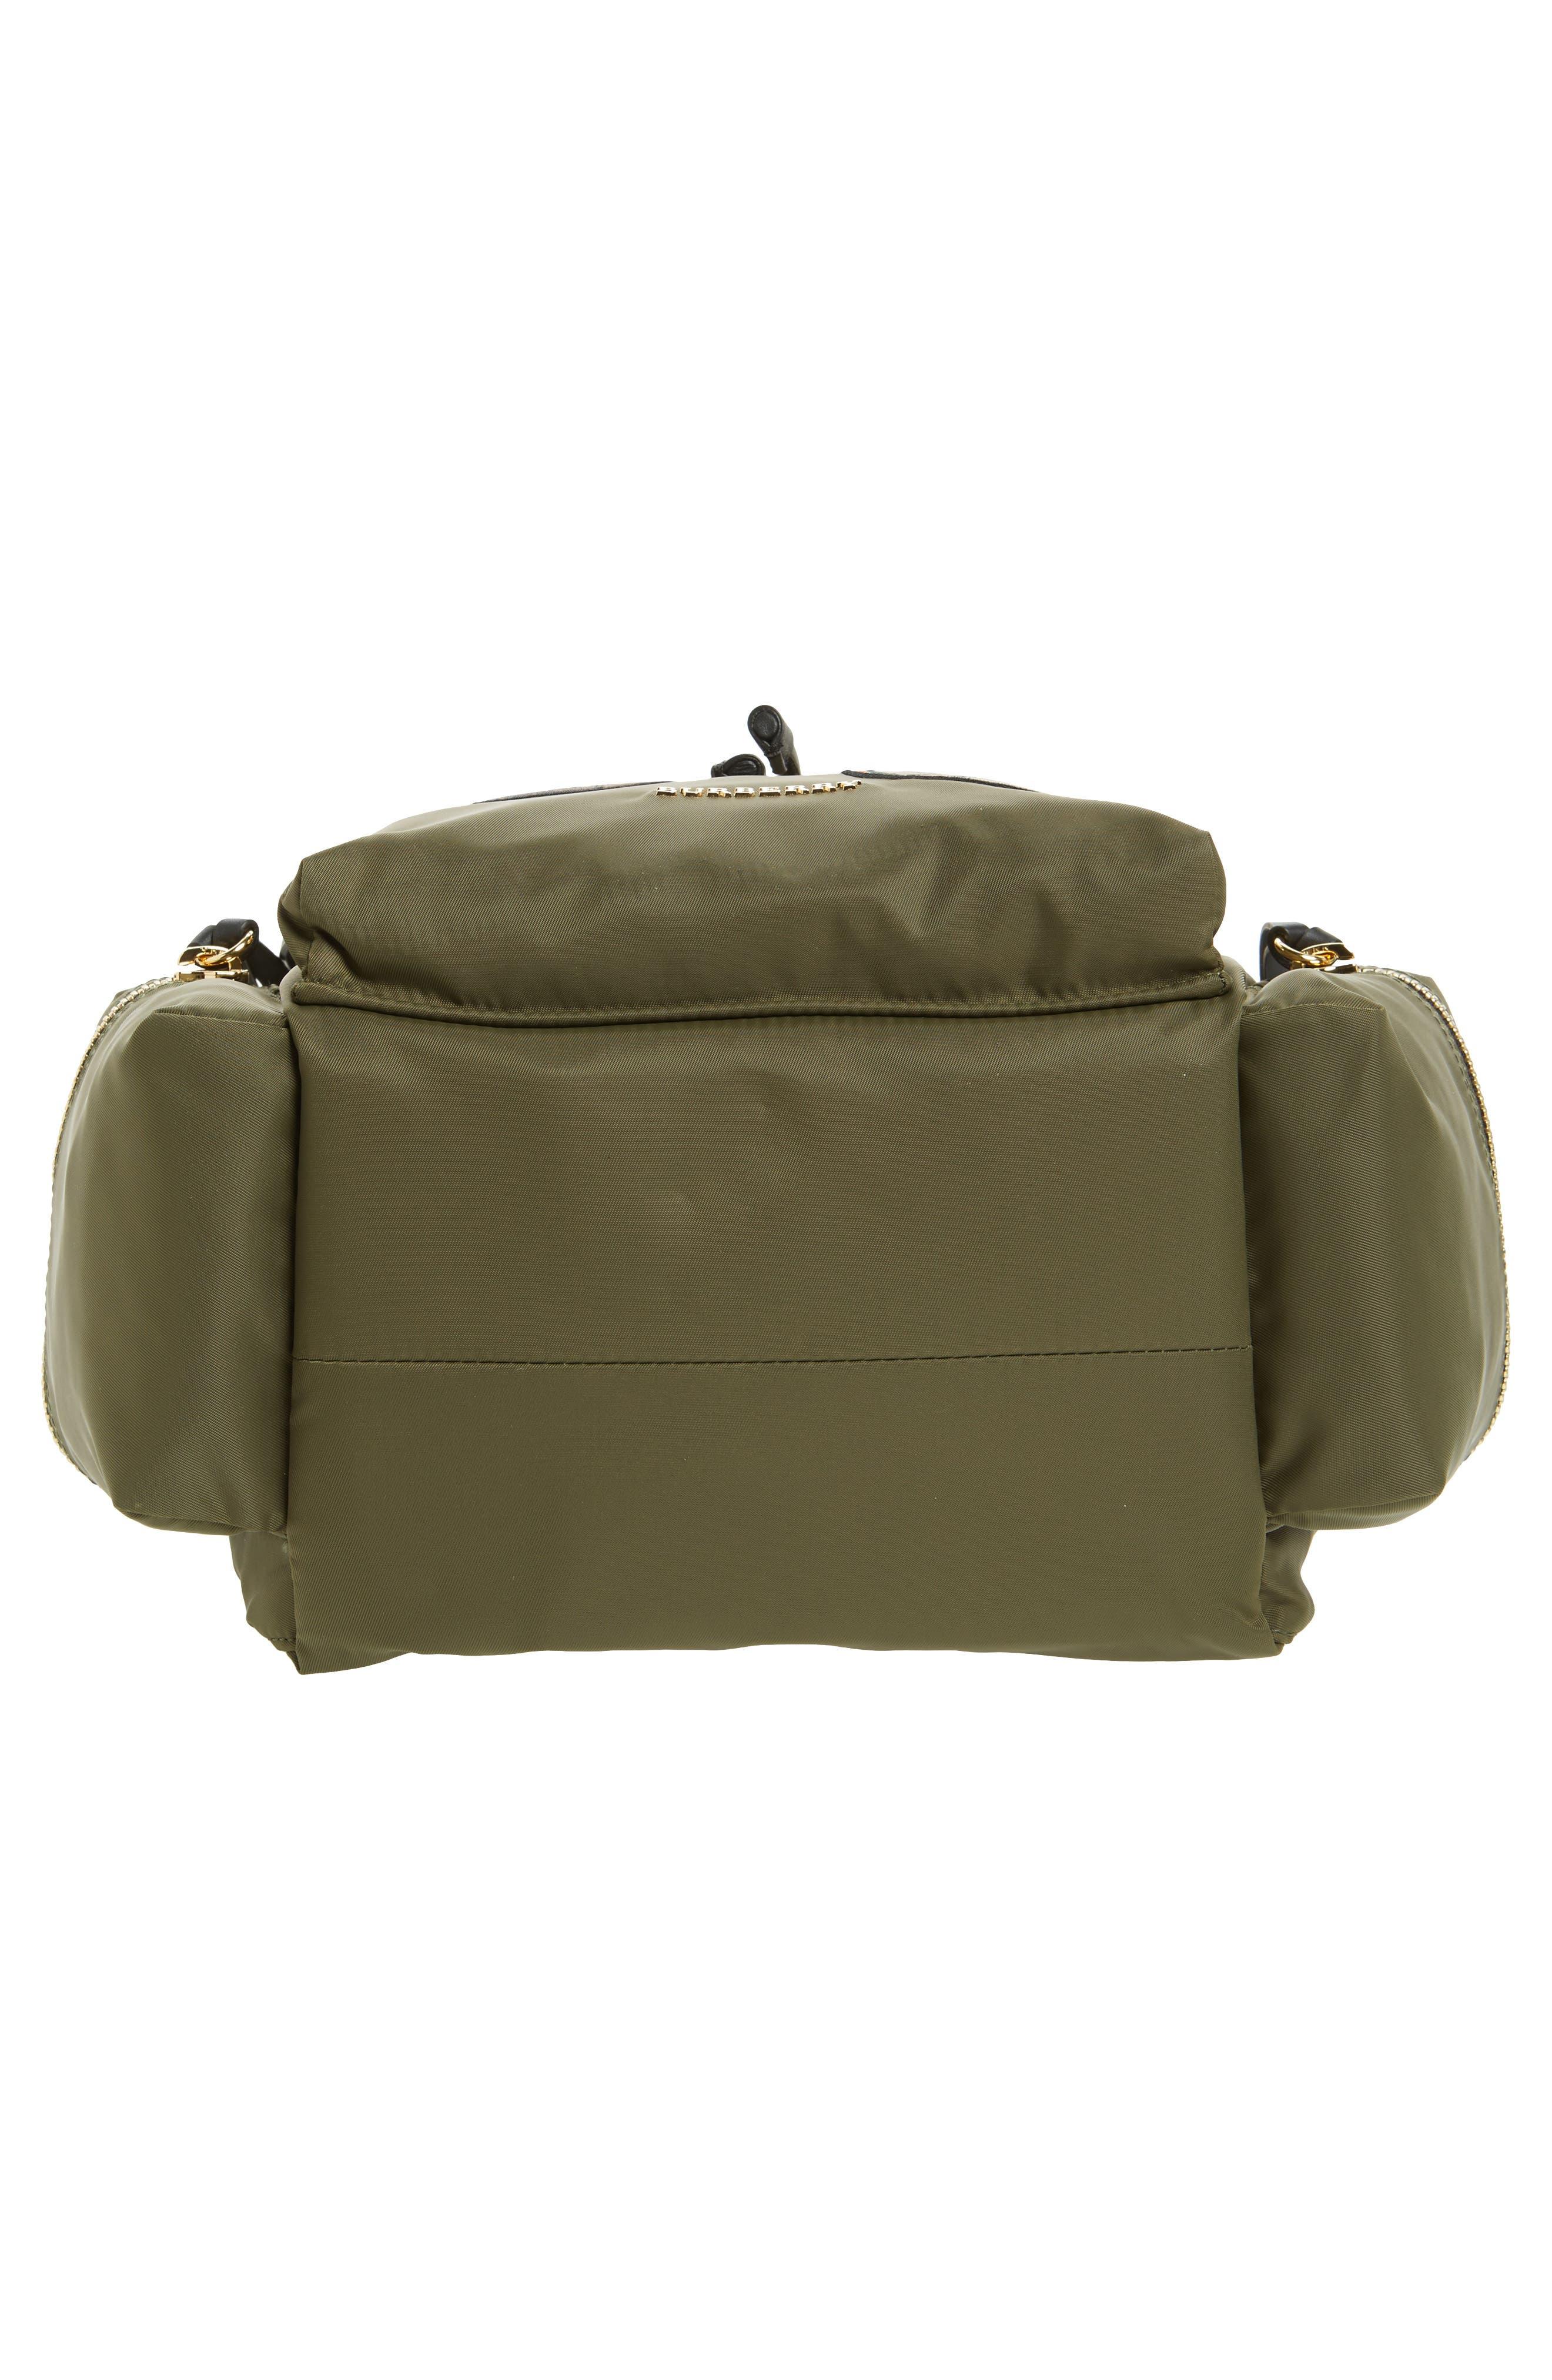 Medium Patches Rucksack Nylon Backpack,                             Alternate thumbnail 5, color,                             Canvas Green